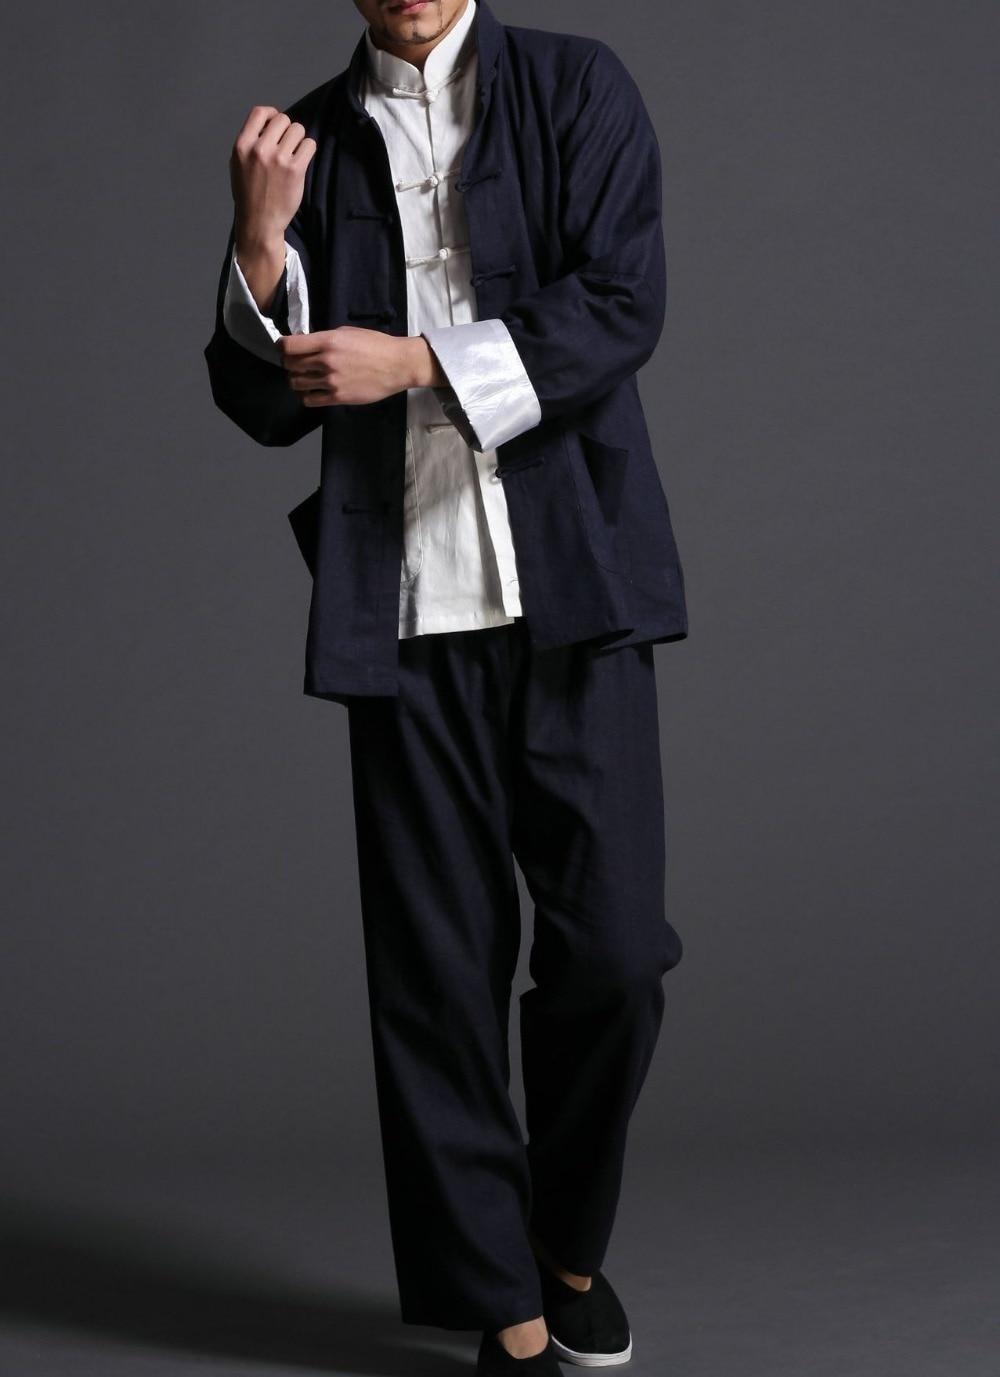 men-male-traditional-tang-suits-Martial-arts-tai-chi-clothing-sets-kung-fu-uniforms-souvenir-wing(1)